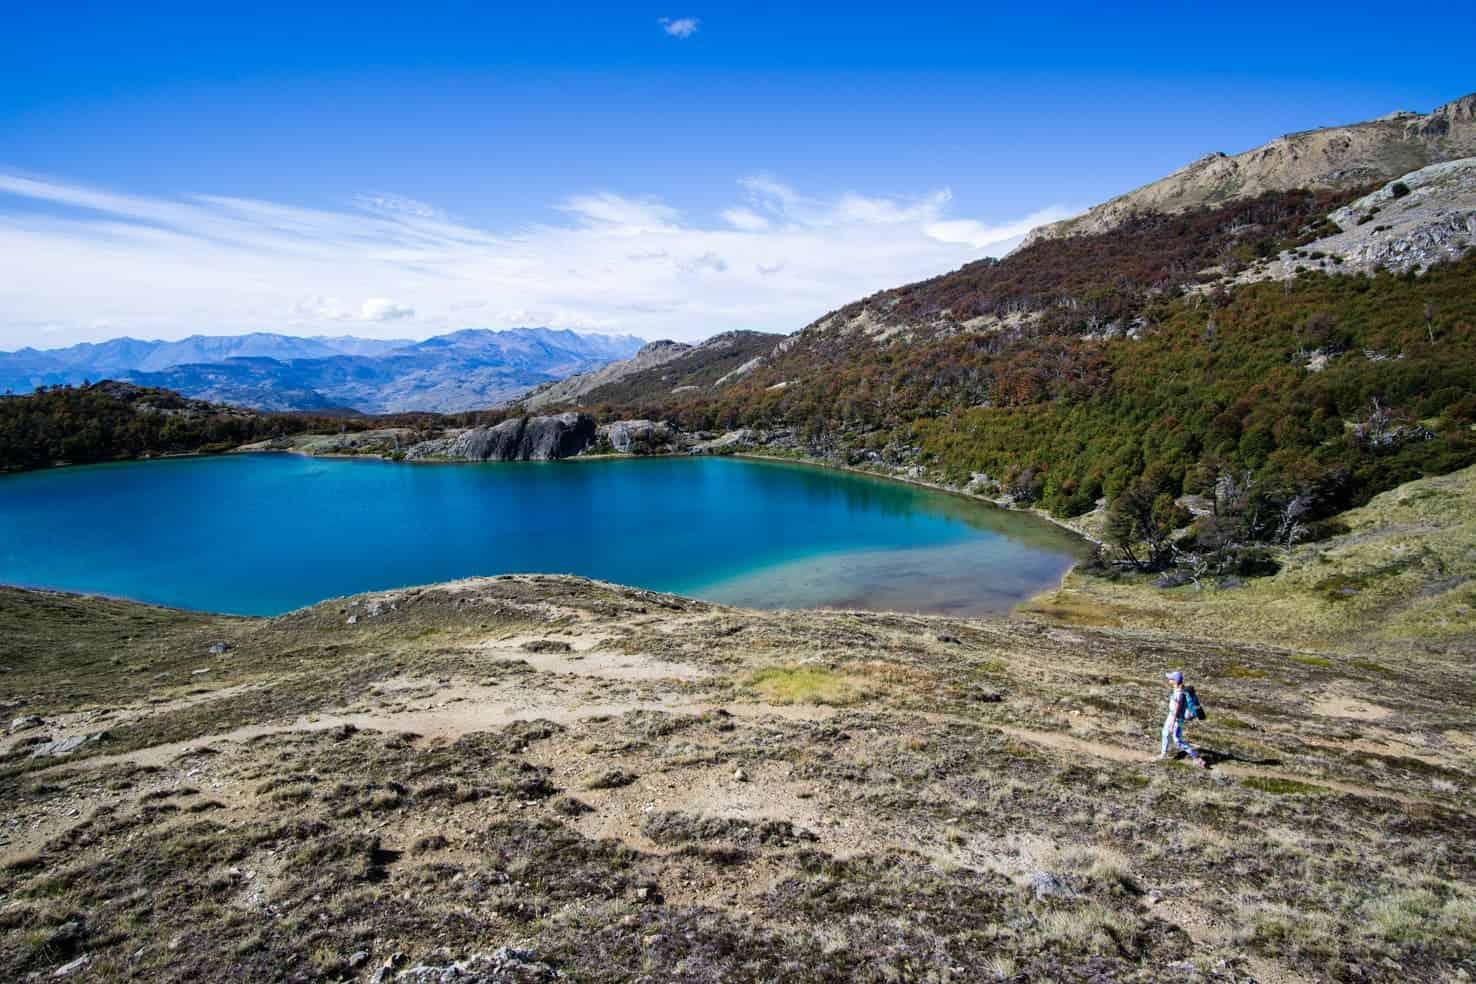 Patagonia National Park, Carretera Austral, Chile